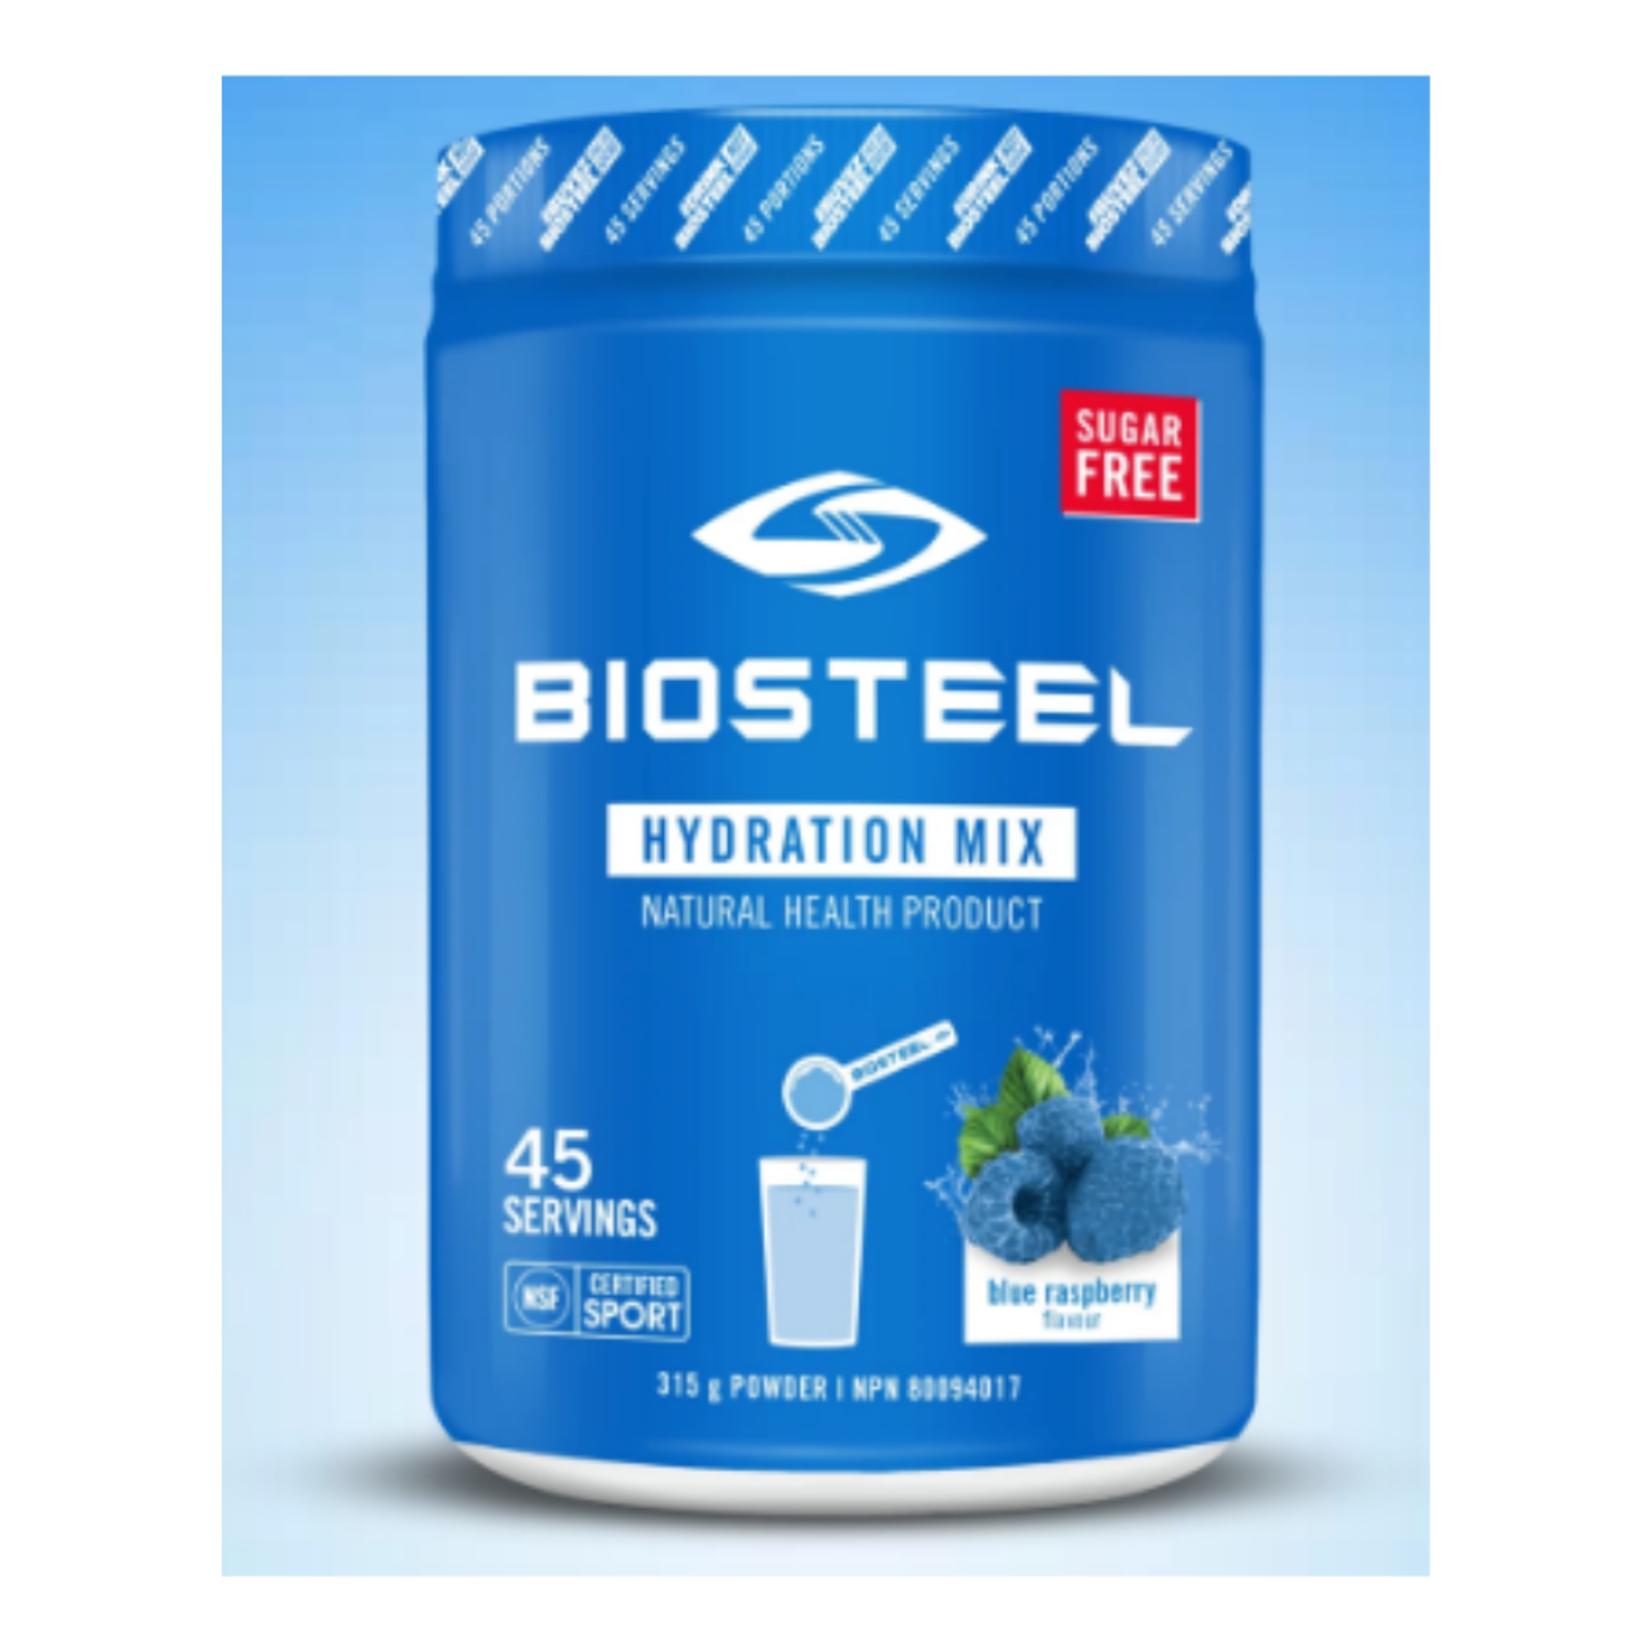 Biosteel Hydration Mix 315g - 45 Servings